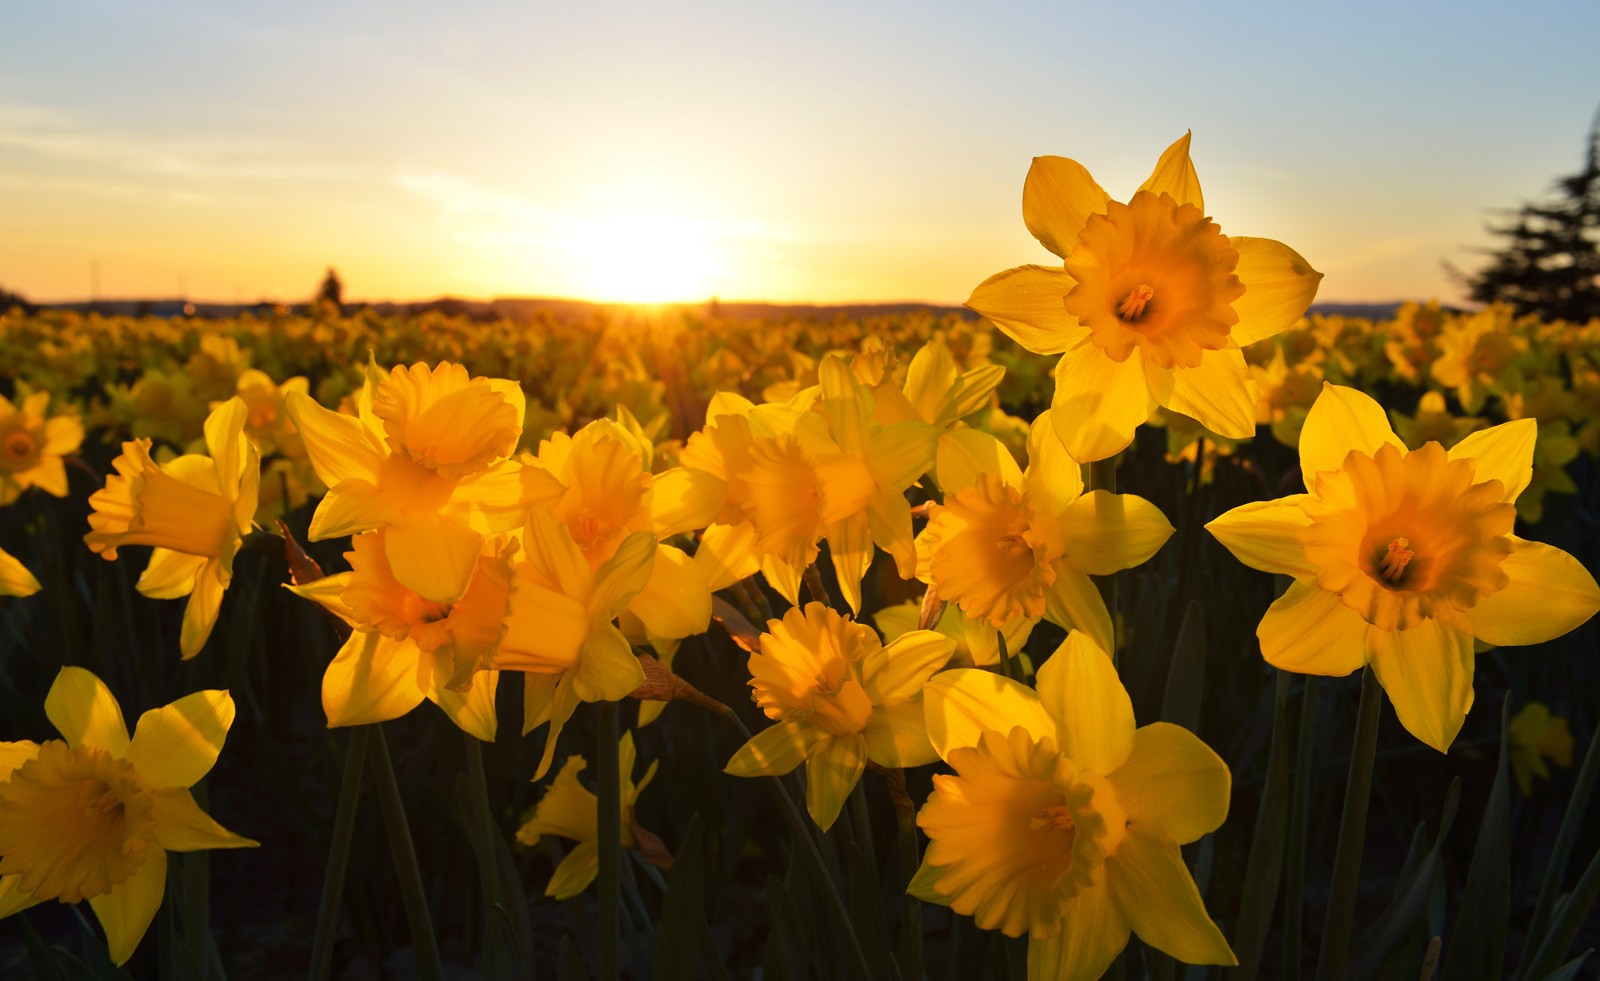 daffodil - photo #48